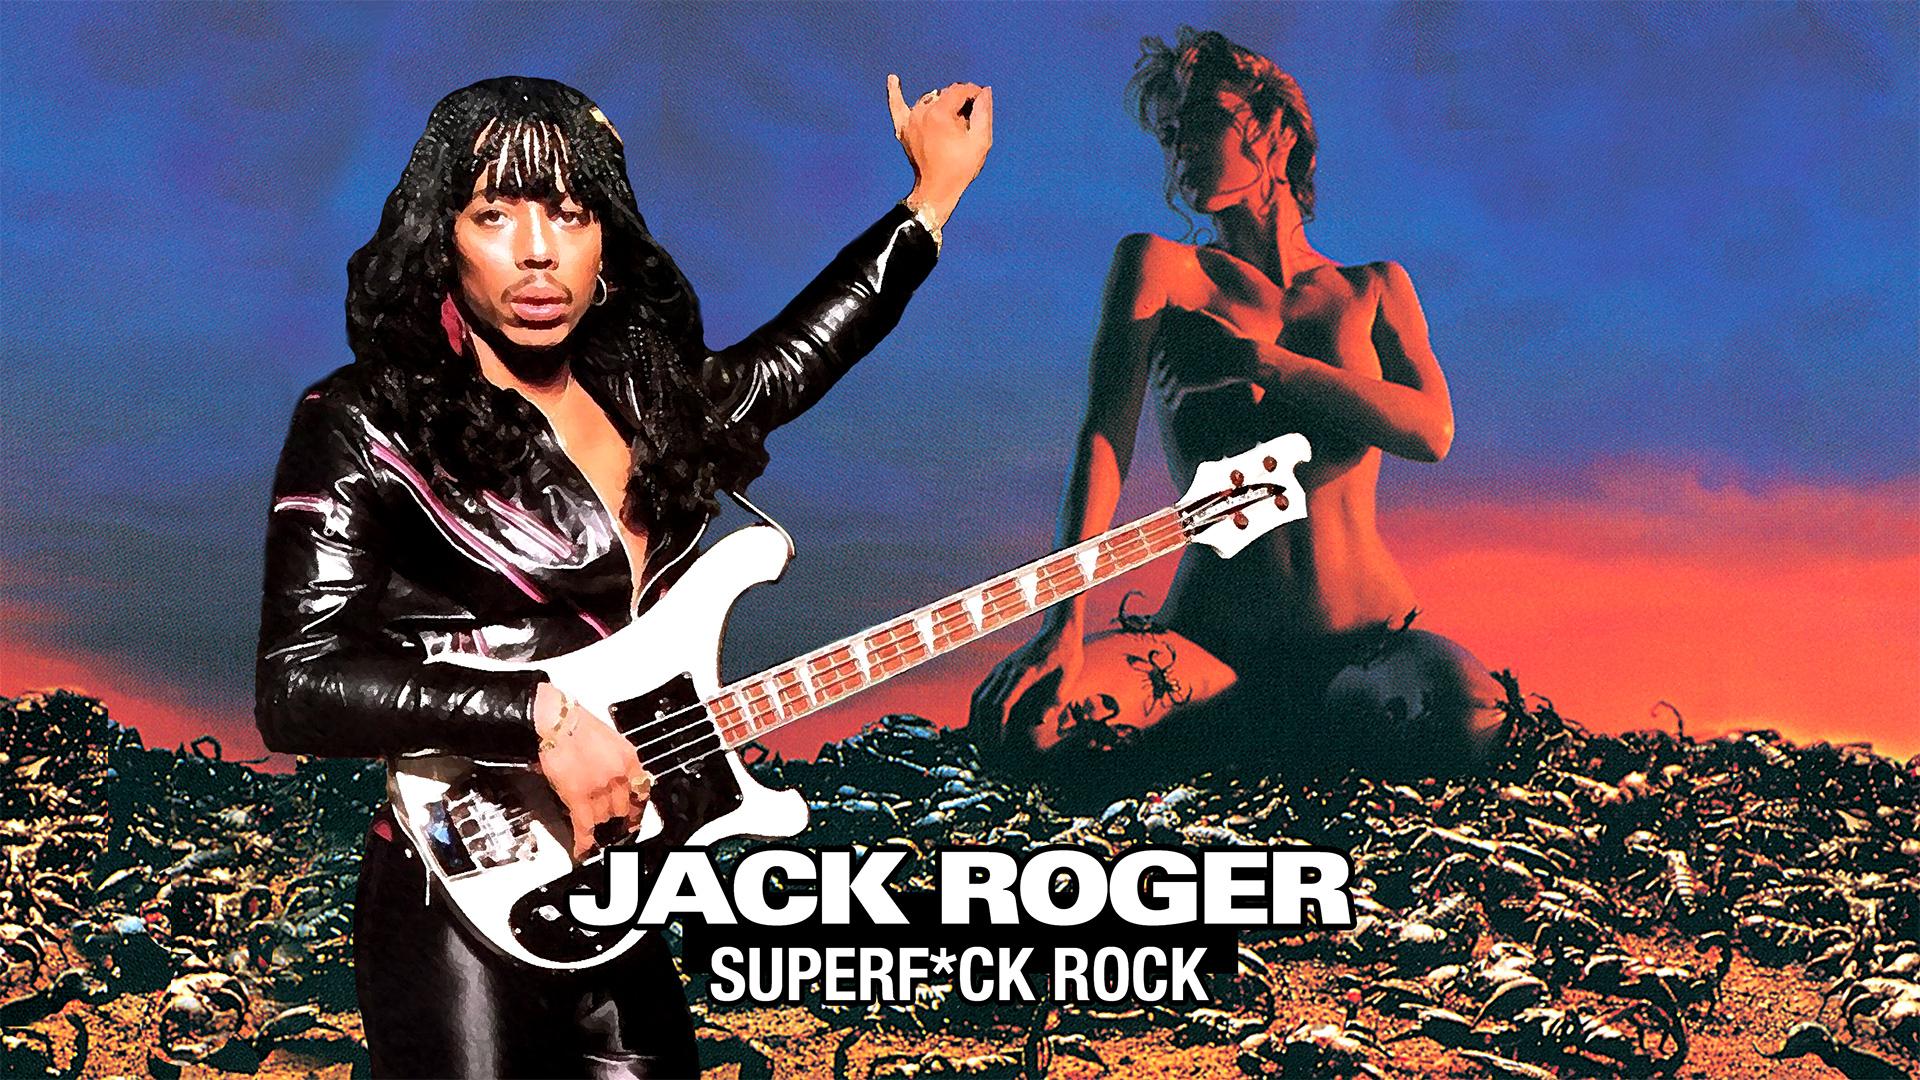 05-Superfuck-Rock-widescreen